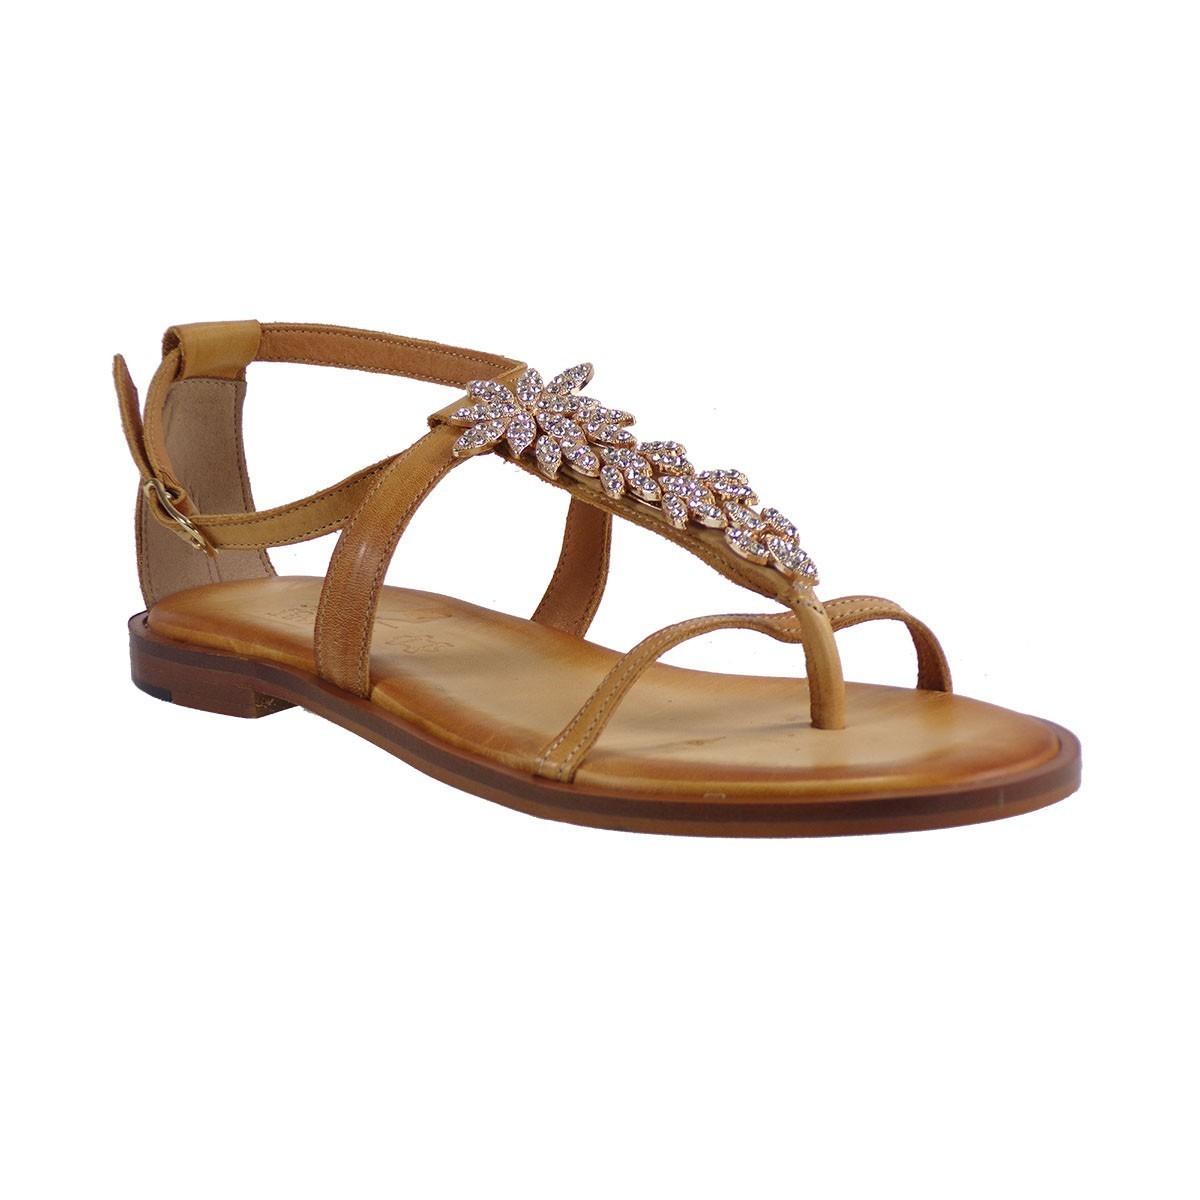 Smart Cronos Γυναικεία Παπούτσια Πέδιλα 6890-1991 Ταμπά Δέρμα